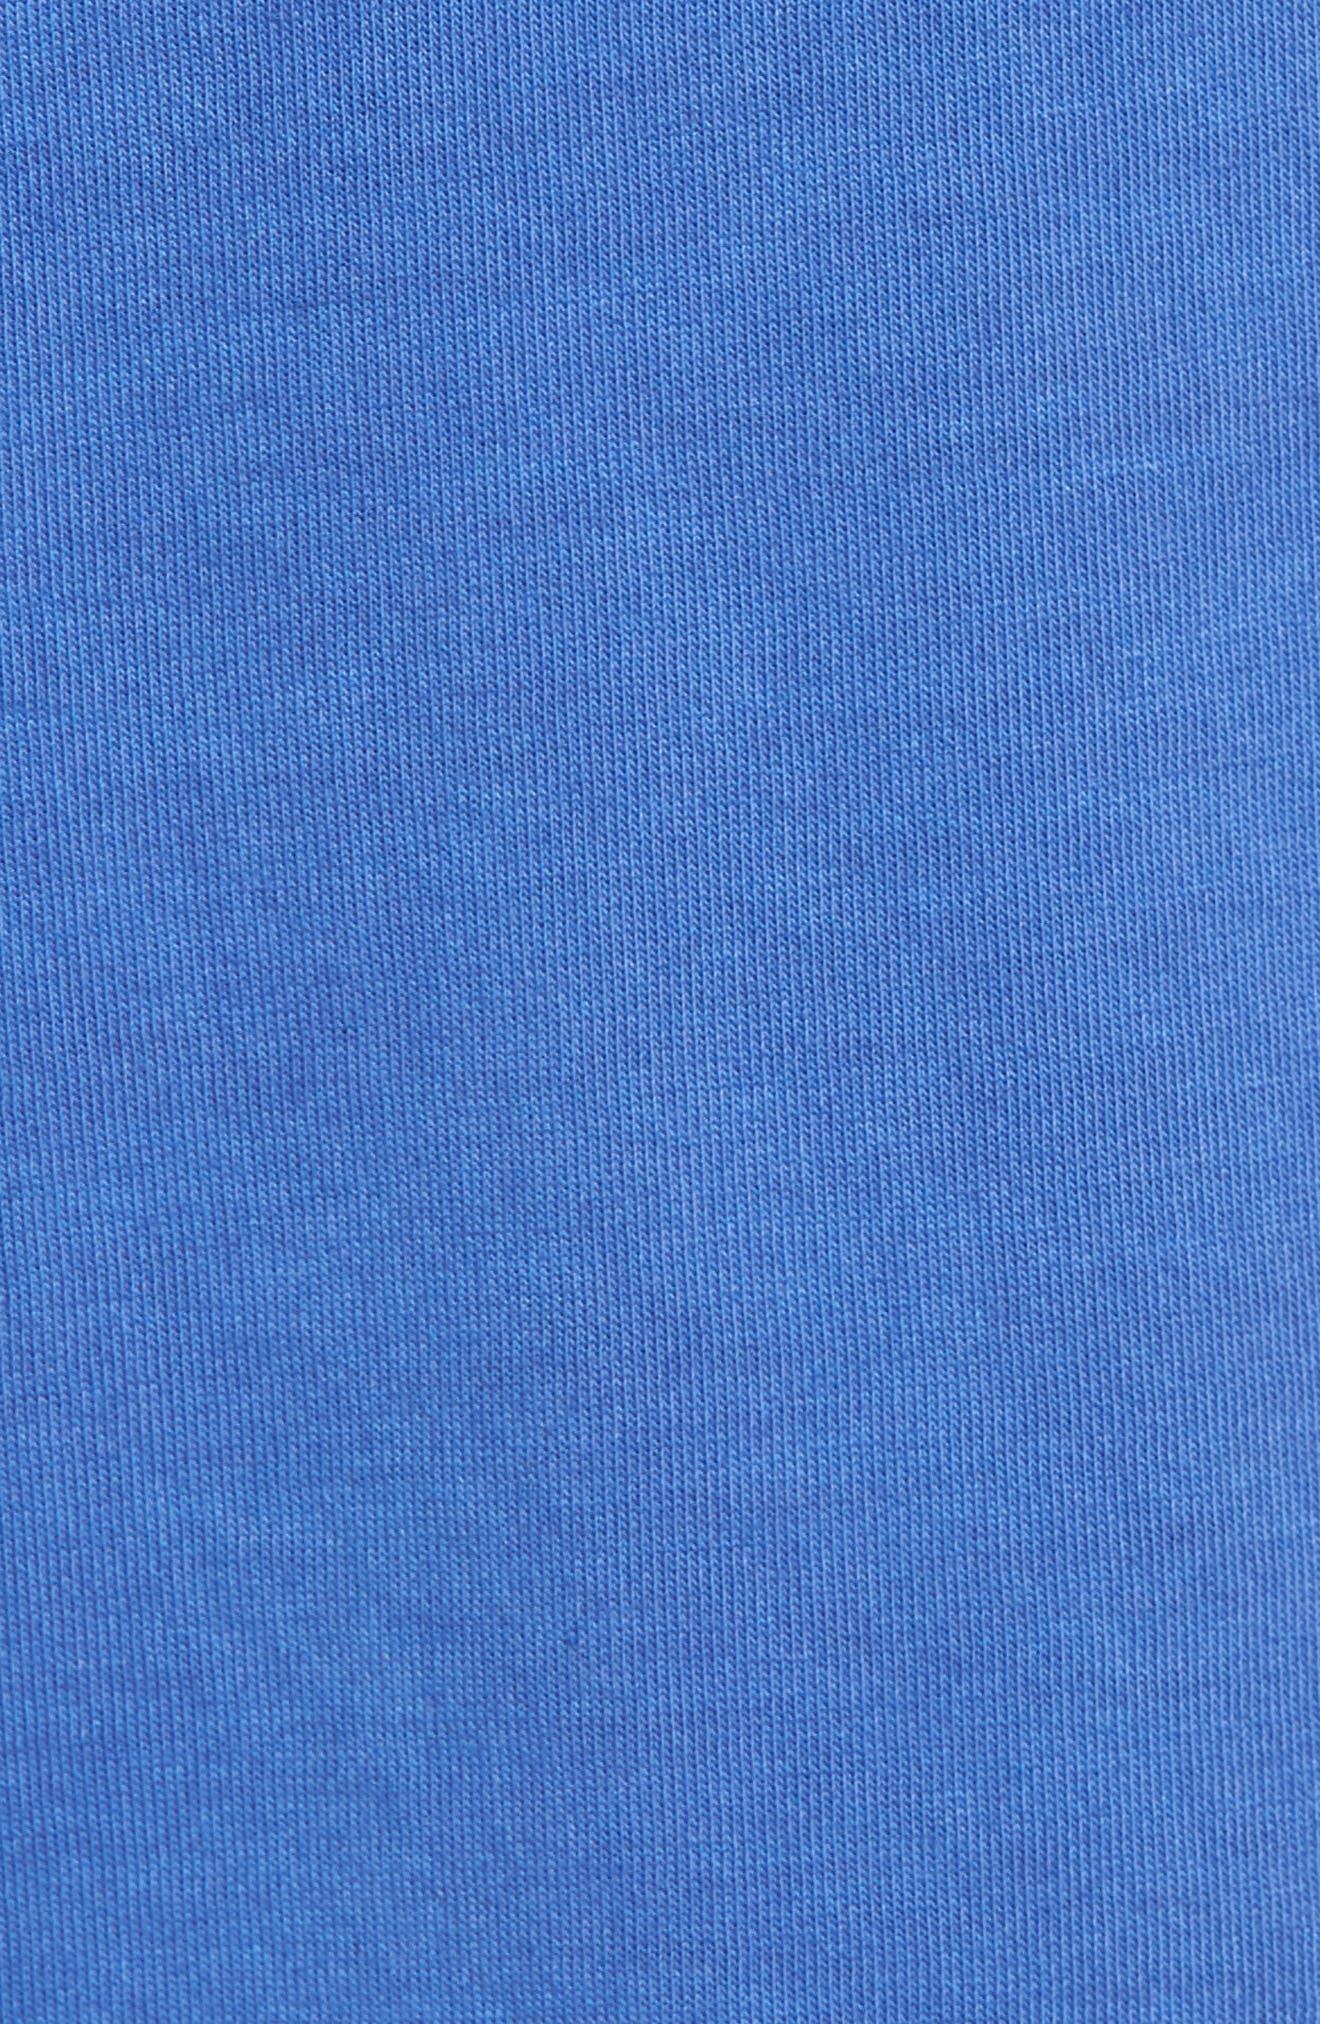 Peruvian Pima Cotton Lounge Shorts,                             Alternate thumbnail 4, color,                             Cobalt Blue